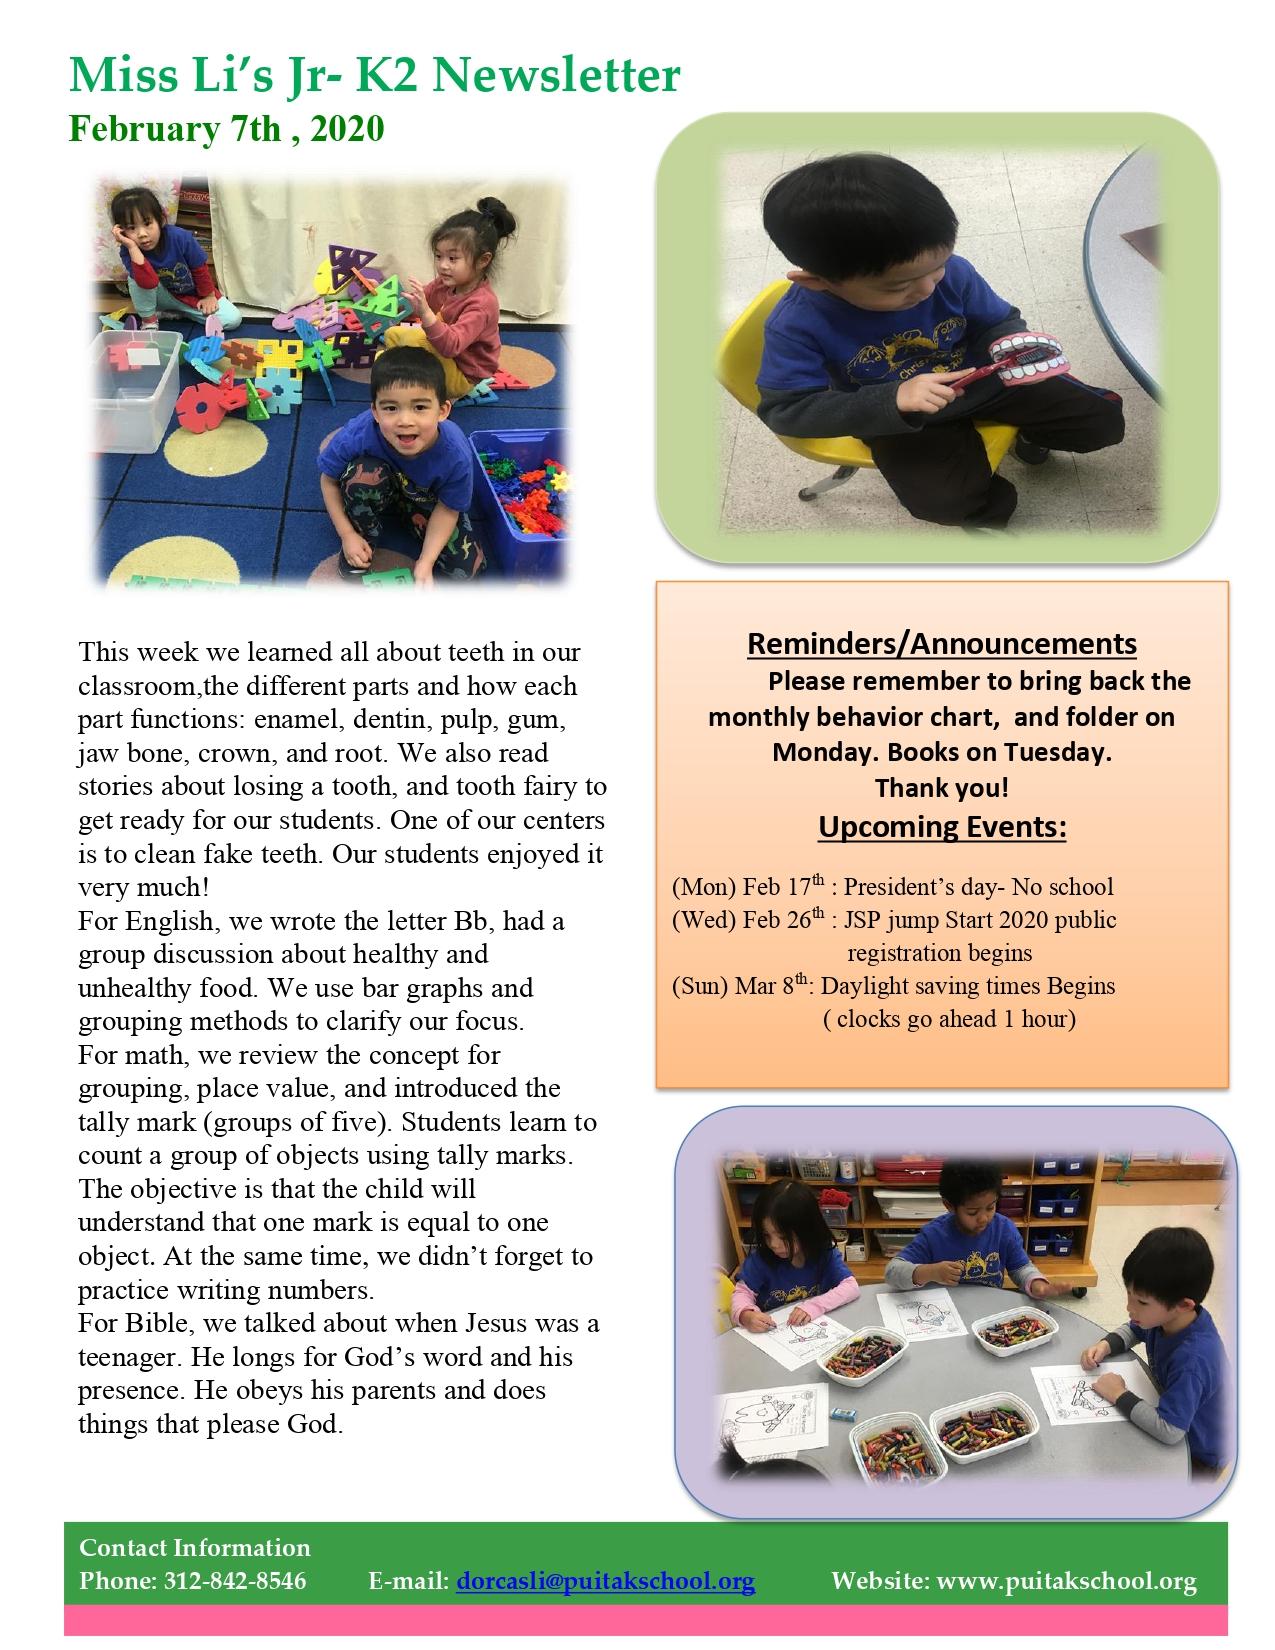 DorcasNewletter2020February1stweek_page-